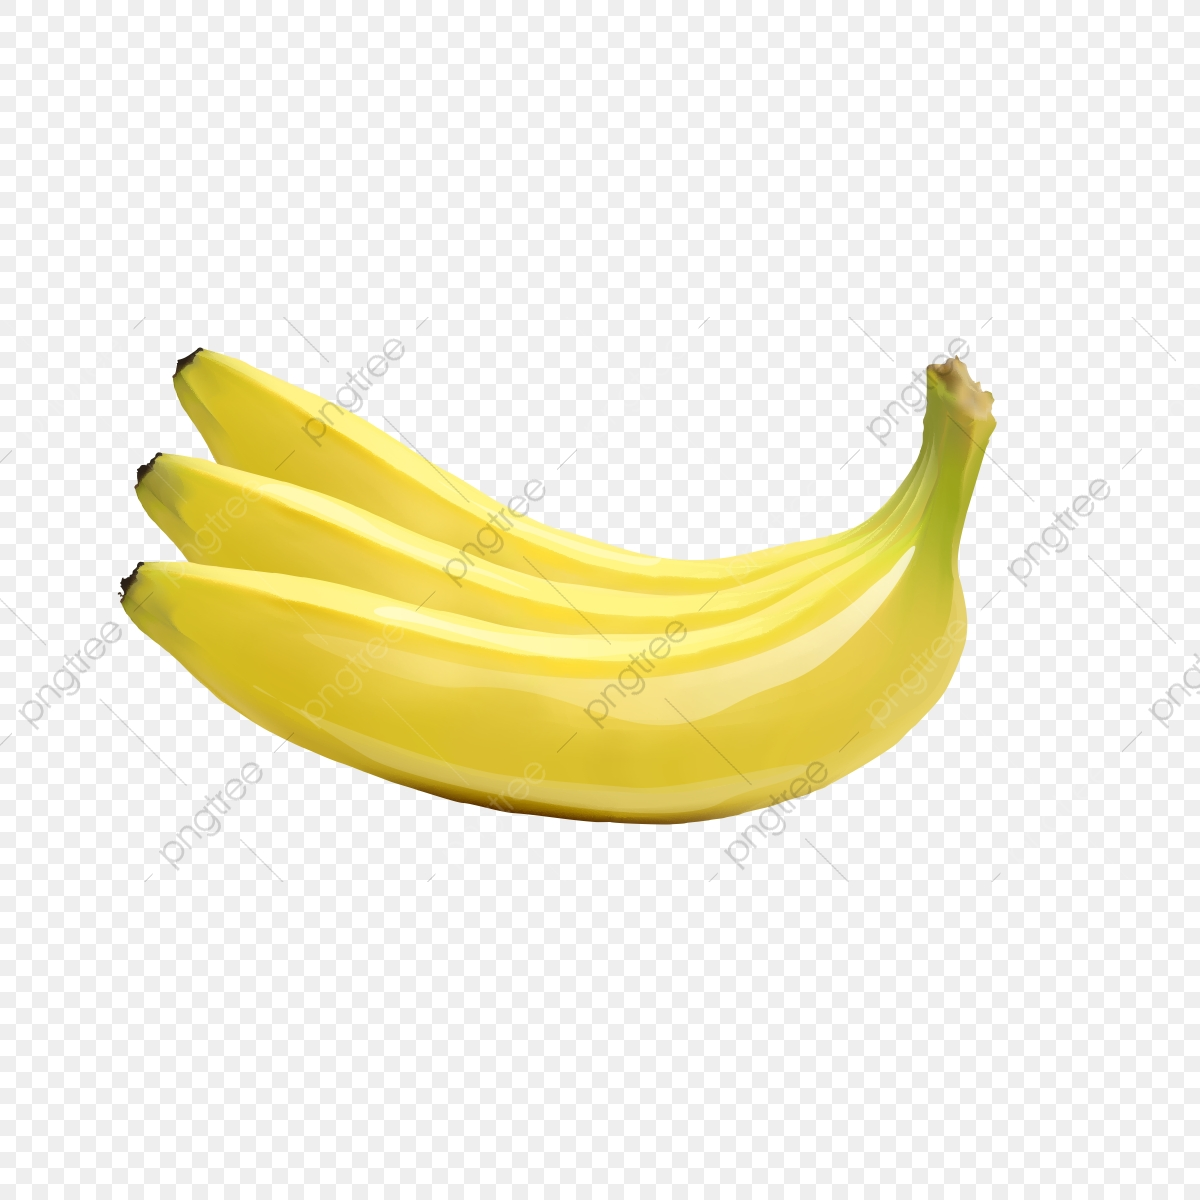 Fruit Drawing Clipart Banana, Fruit, Set Clipart, Exquisite Clipart.